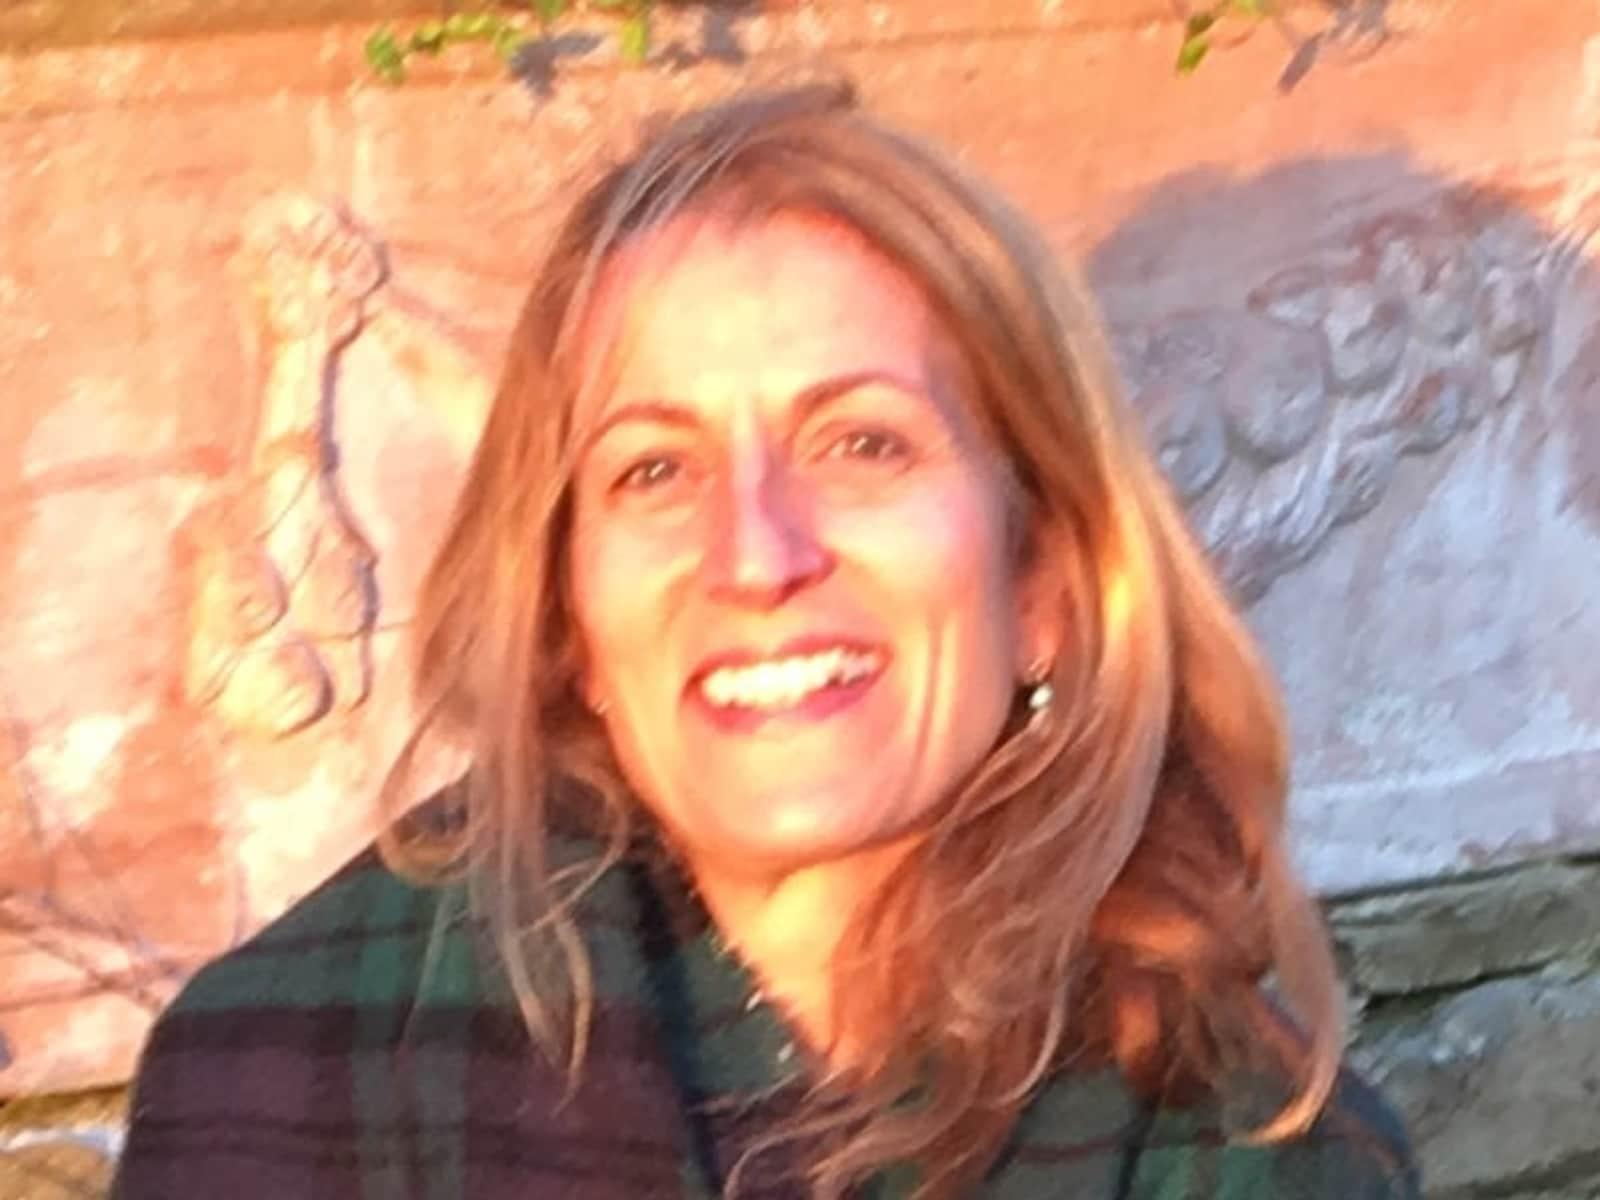 Meg from York, United Kingdom